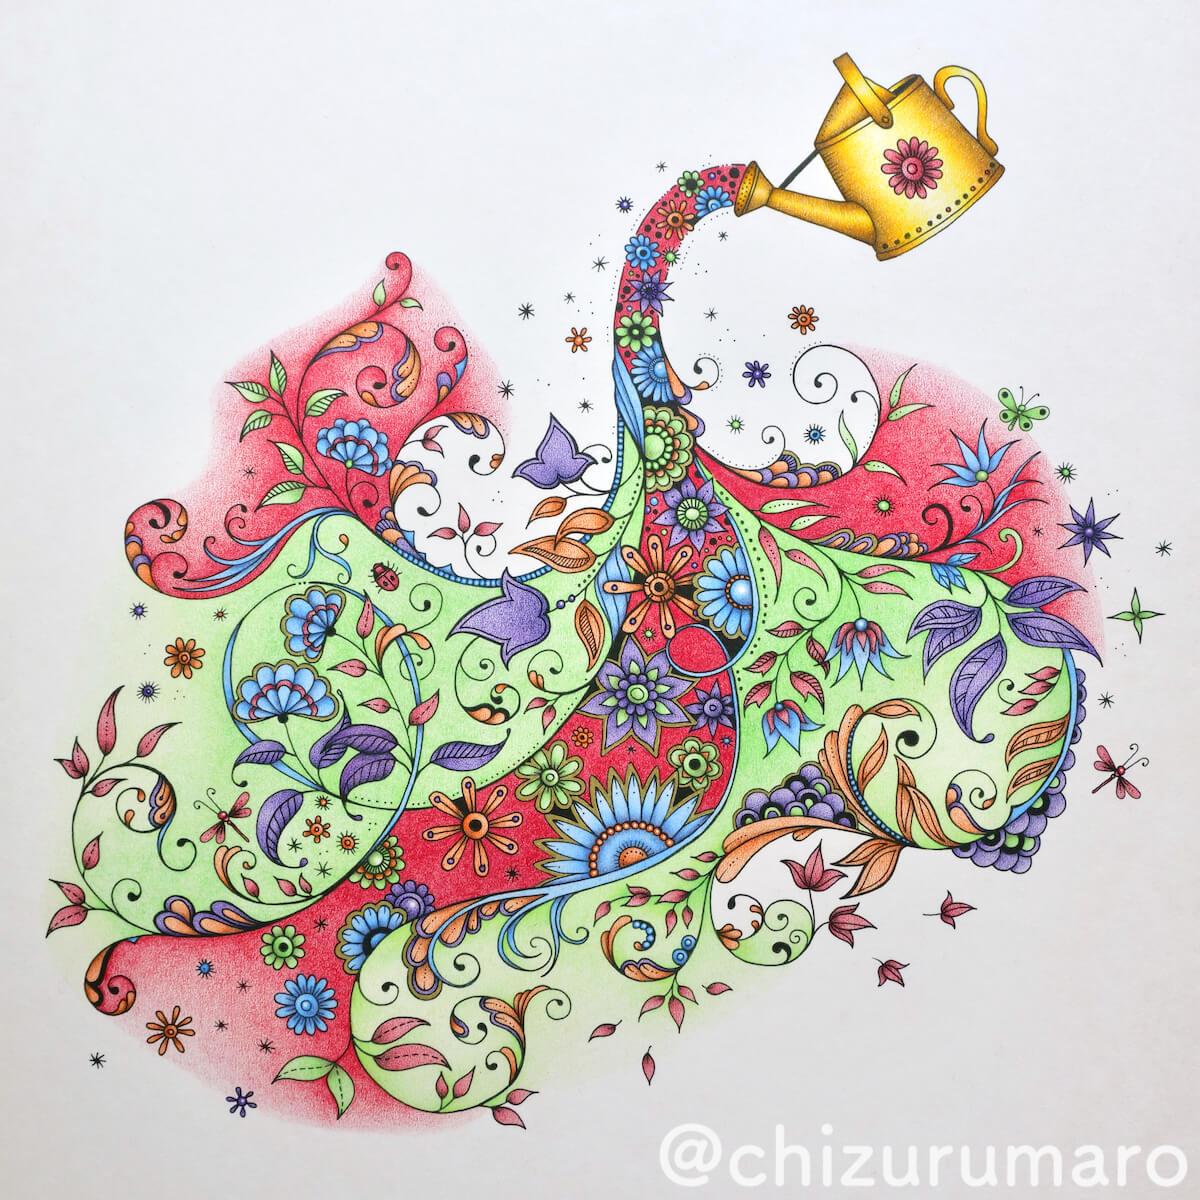 f:id:chizurumaro:20210226125650j:plain